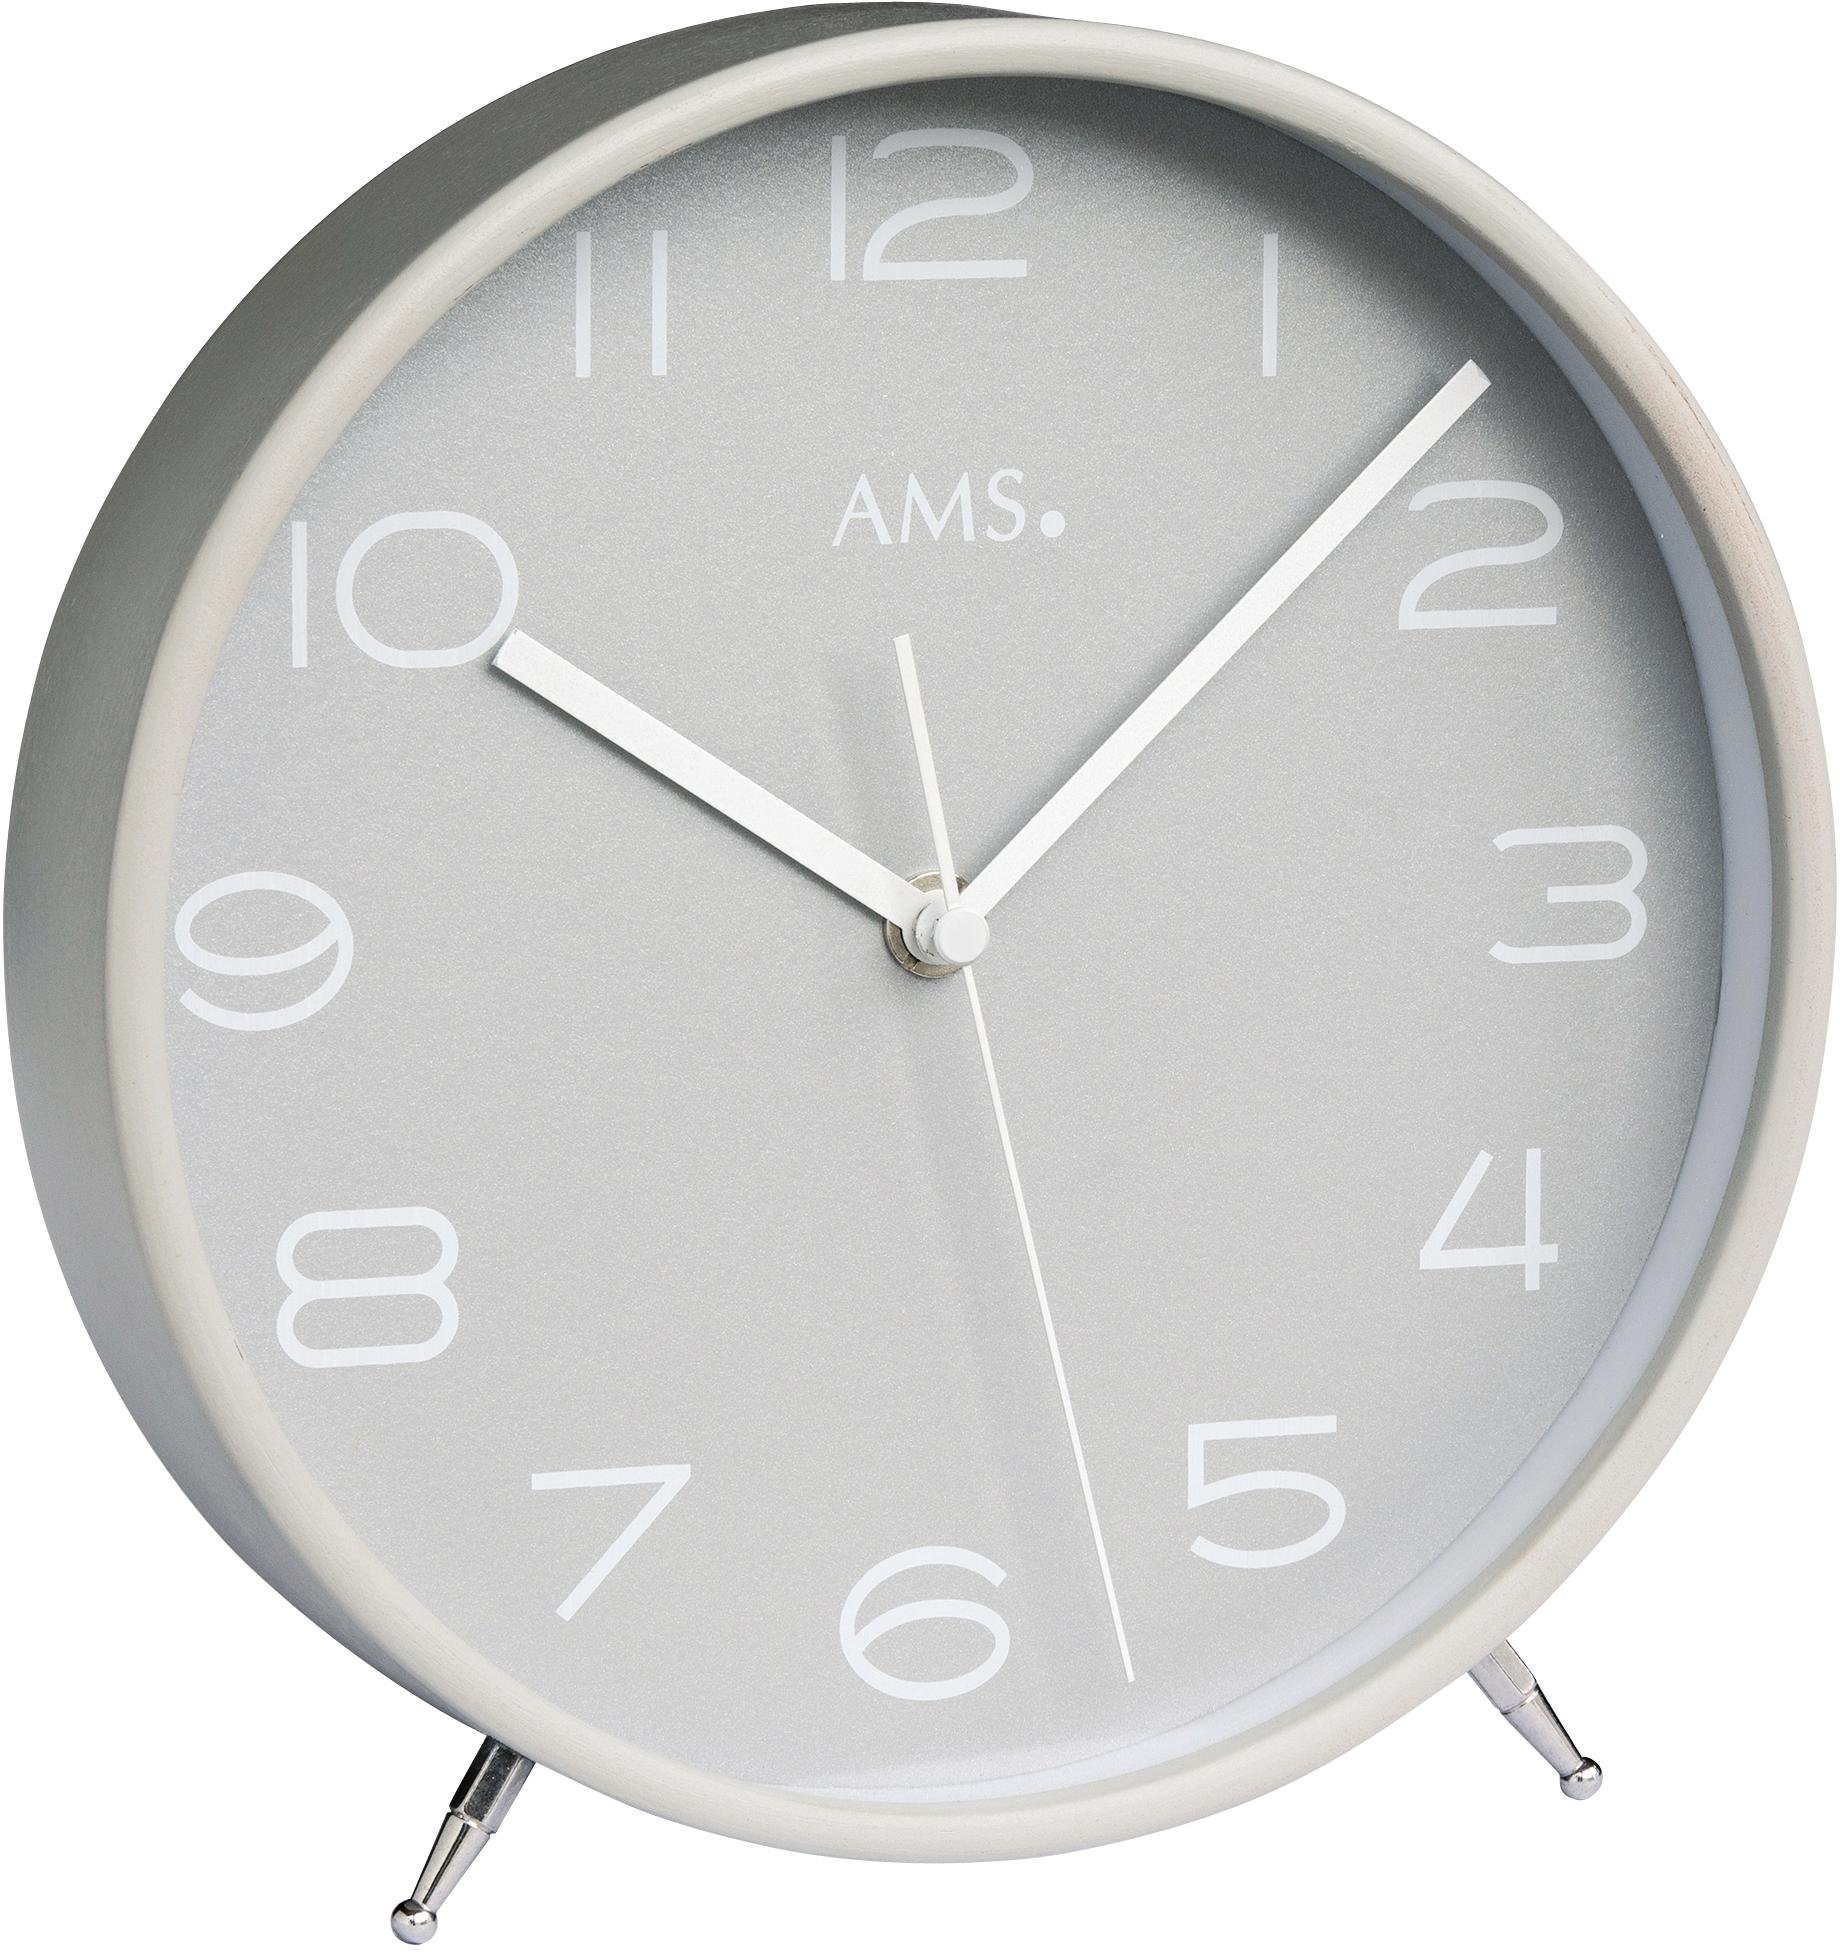 AMS Funktischuhr »F5119« | Dekoration > Uhren > Standuhren | Holz | AMS